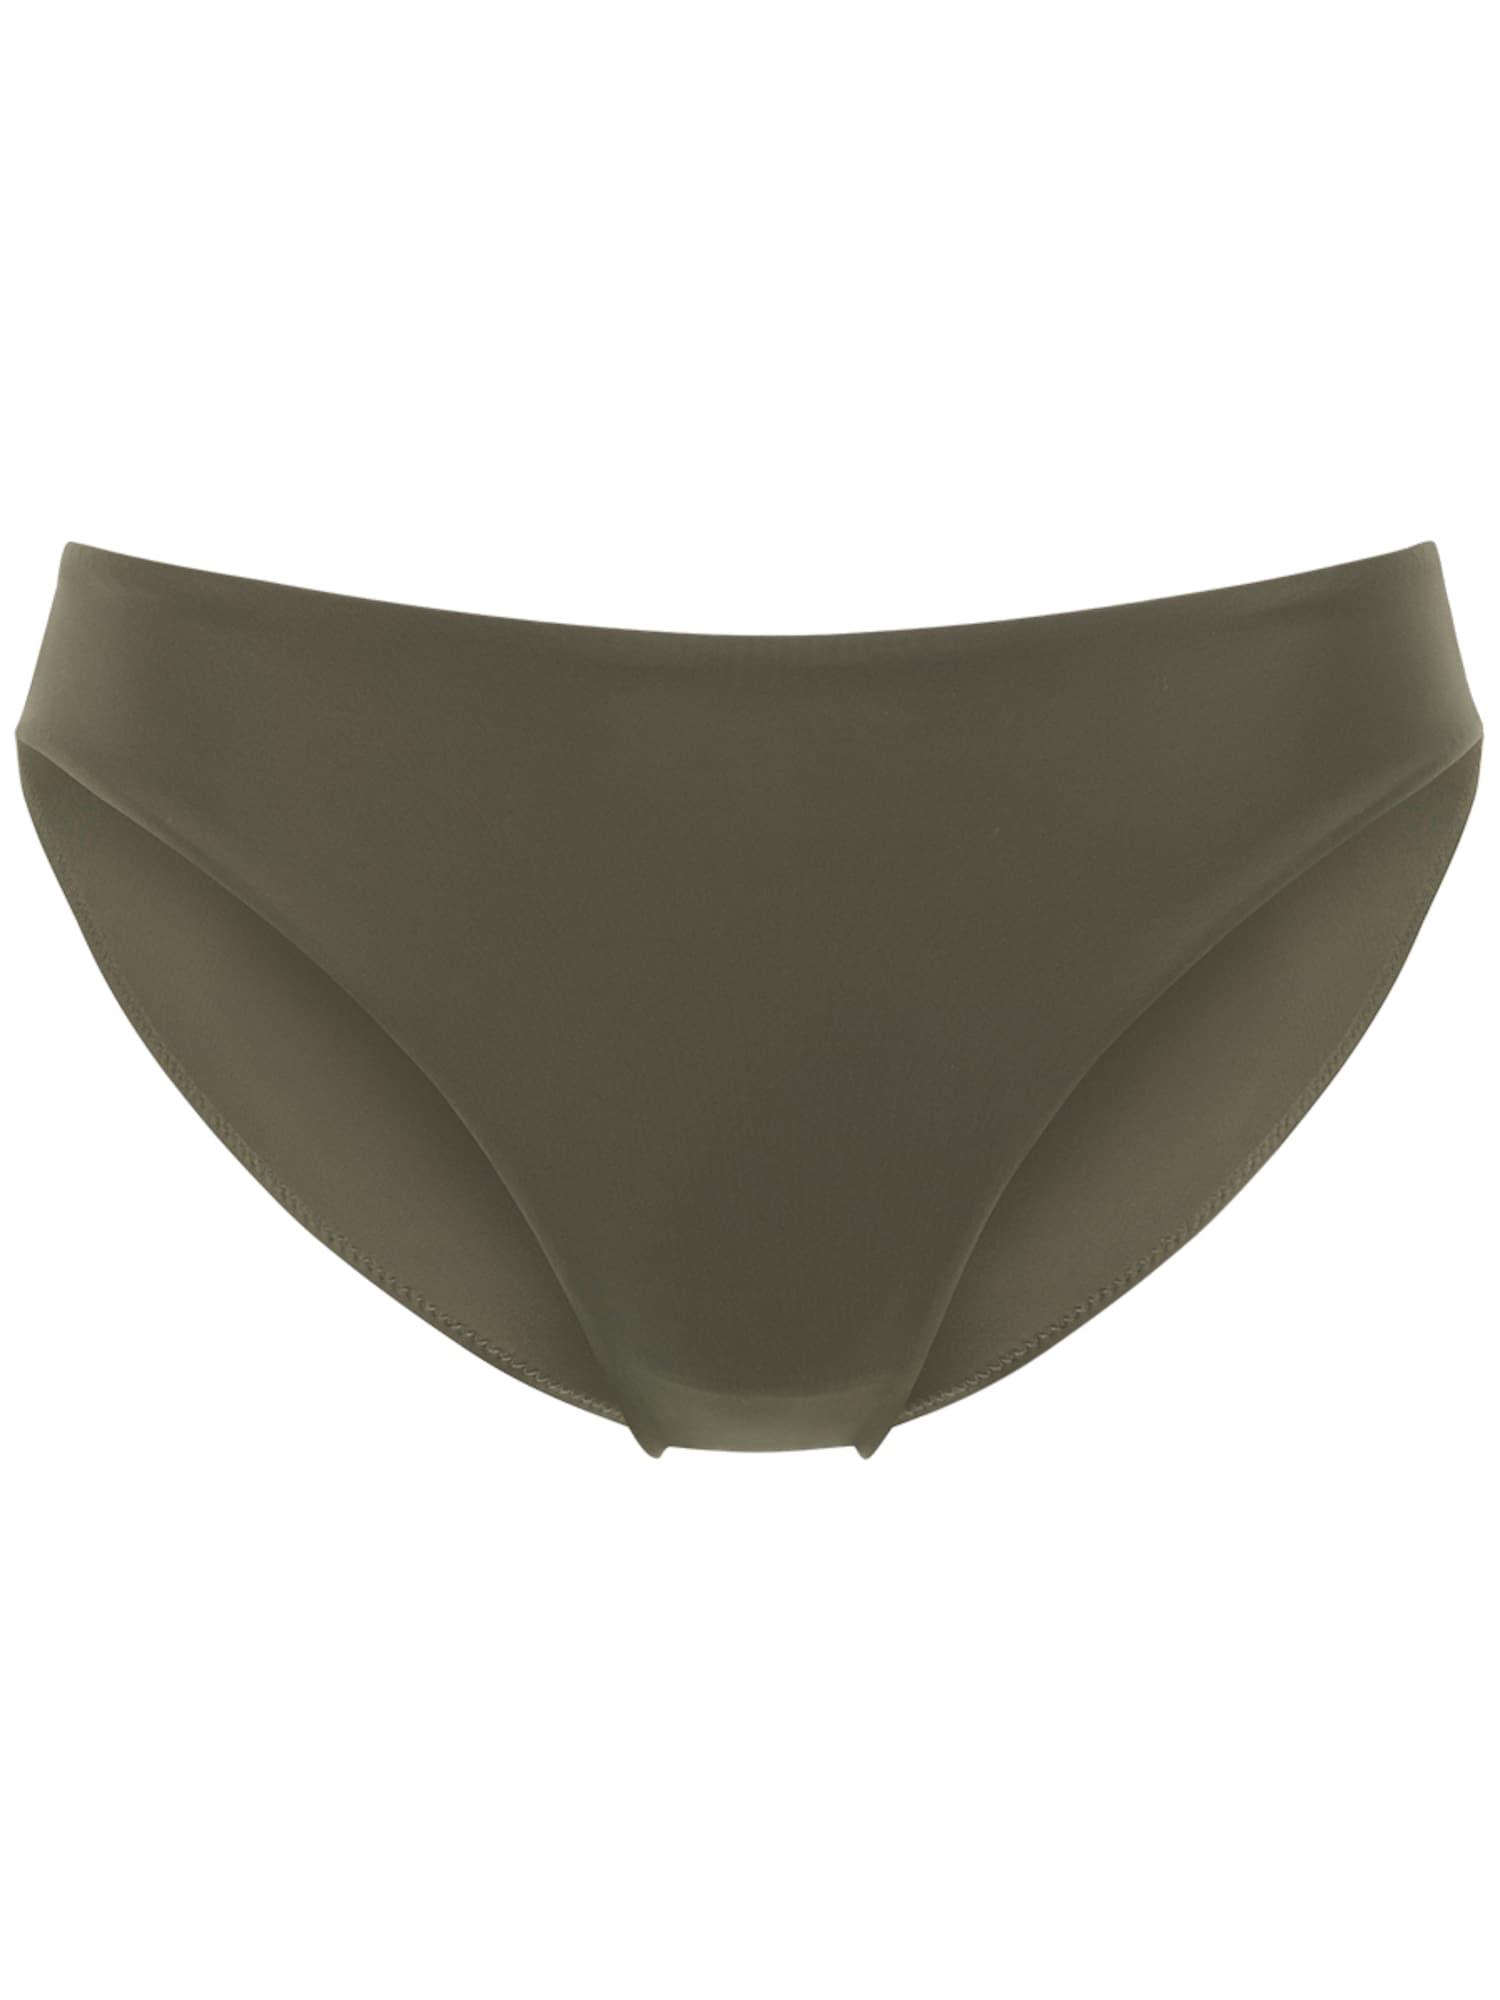 Kalhotky Contour Minislip khaki PALMERS